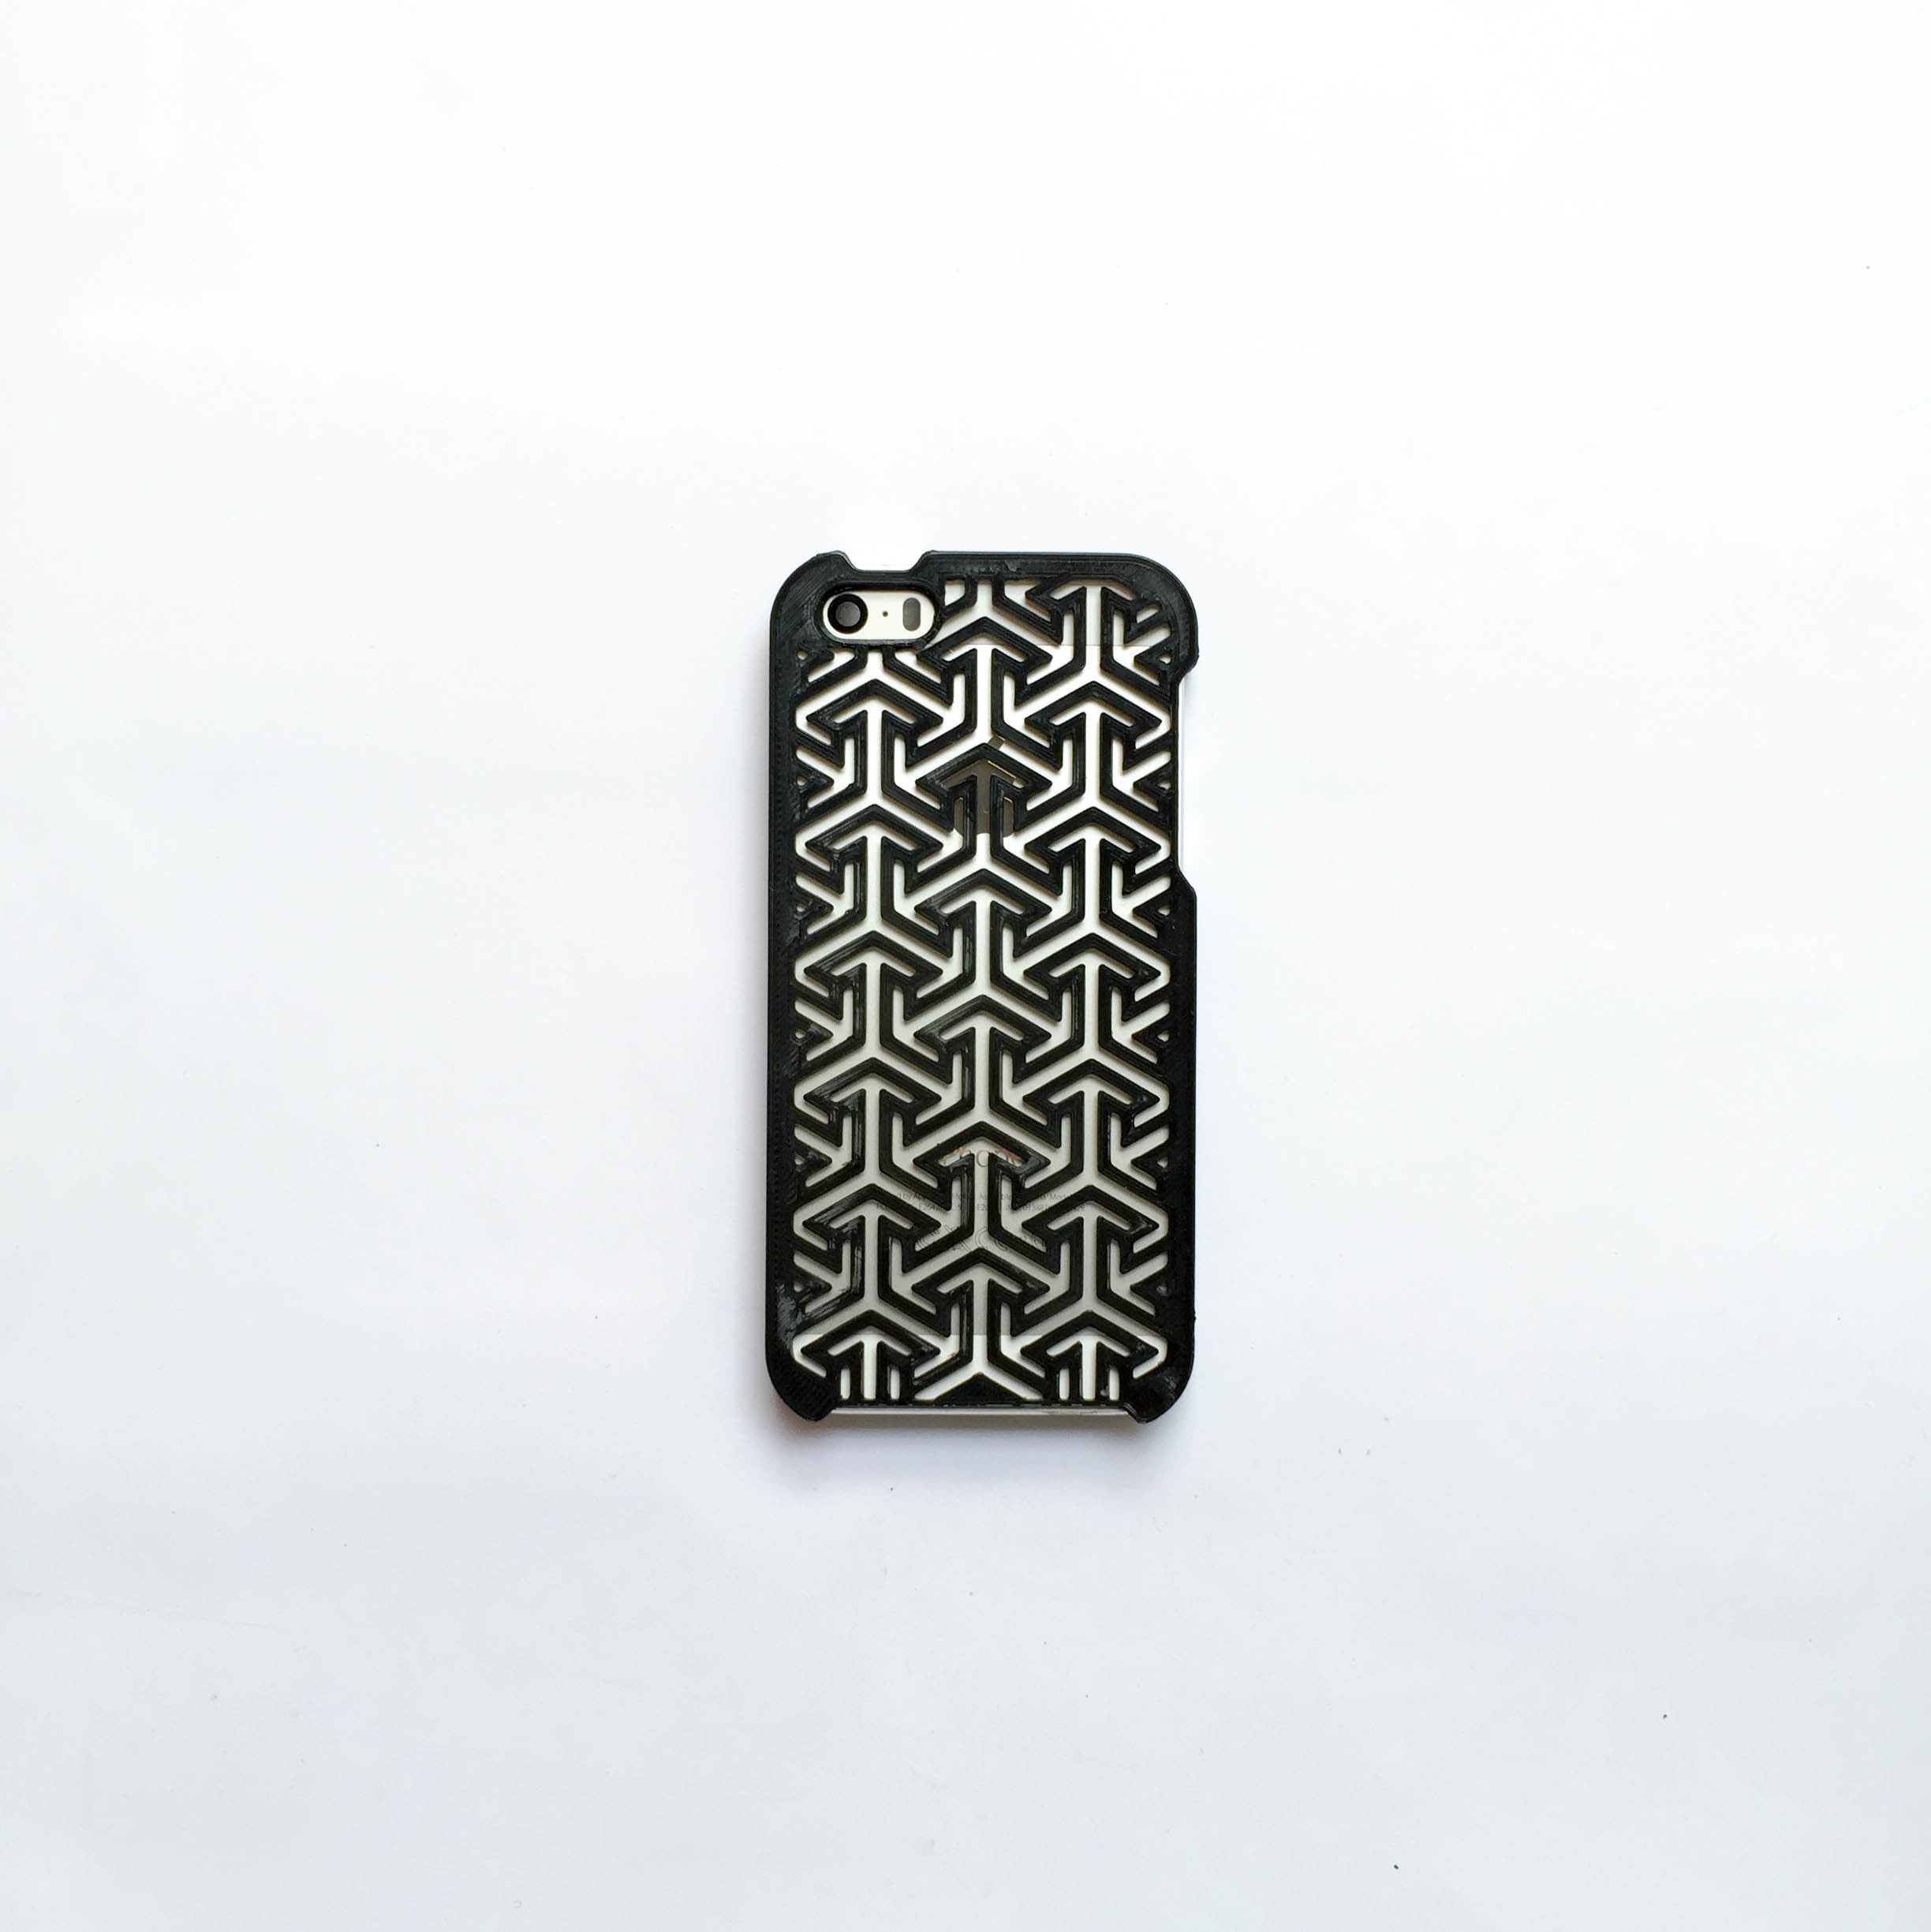 quality design ffe0f 68d28 iPhone 5/5S/SE case - FFWD @ Pinshape